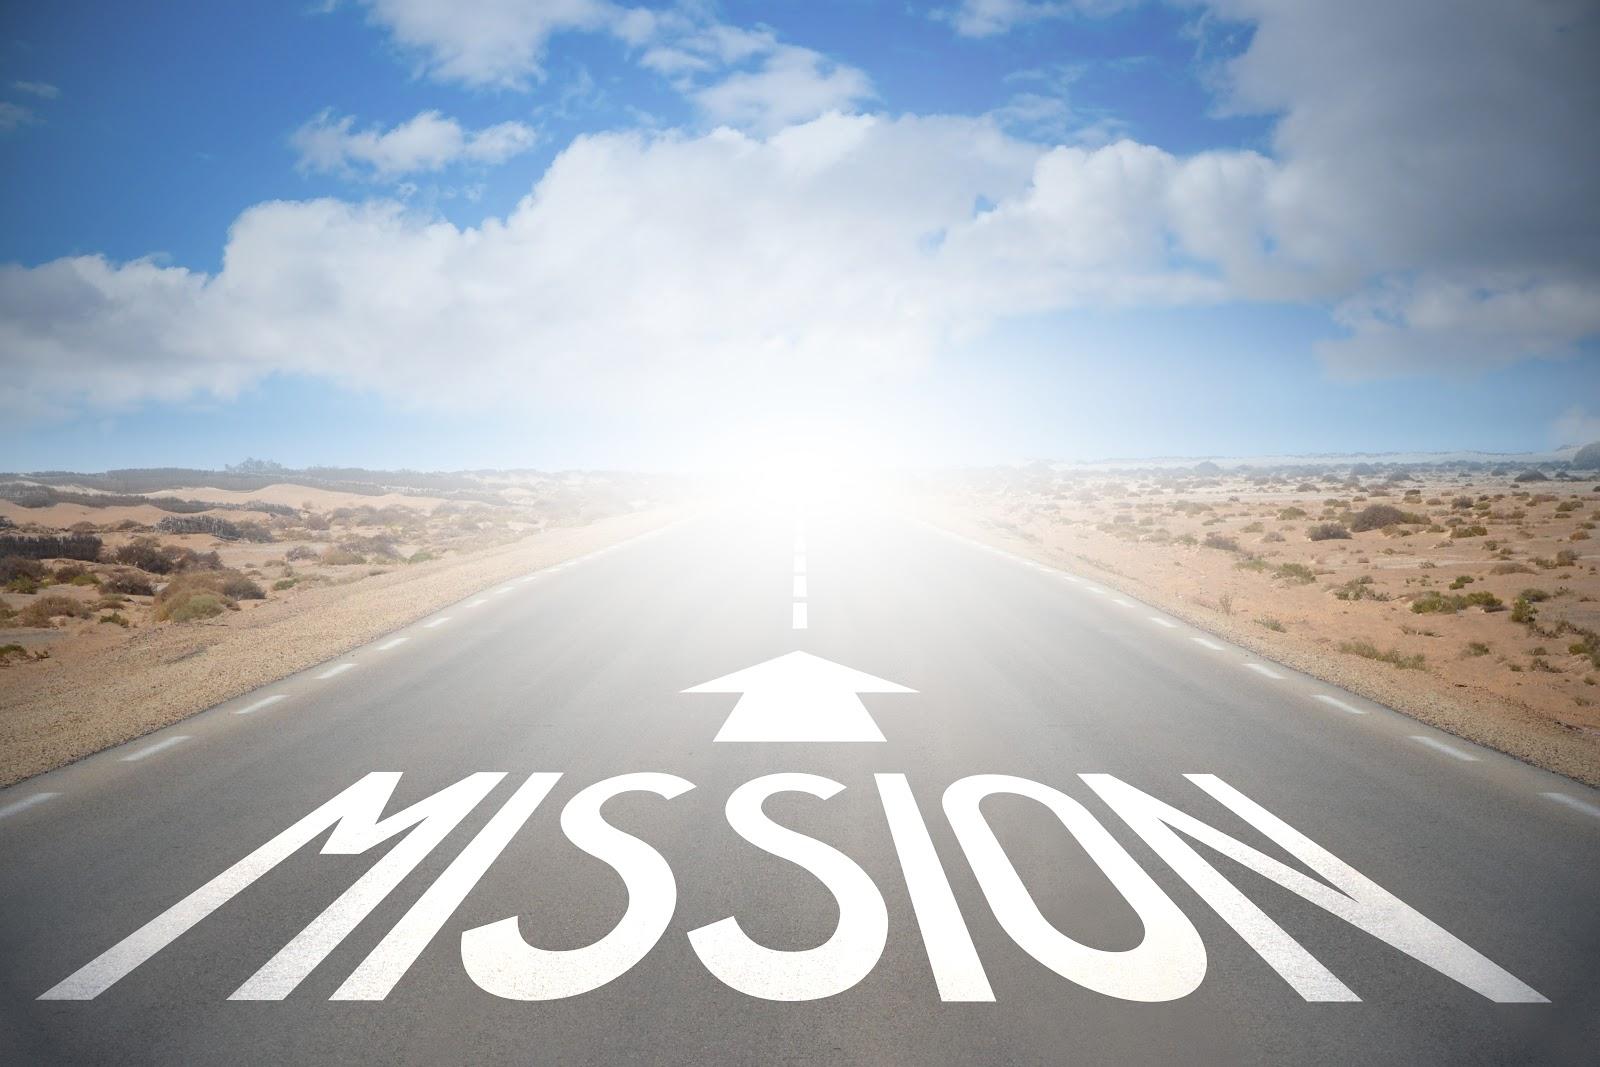 Mission-drive content marketing